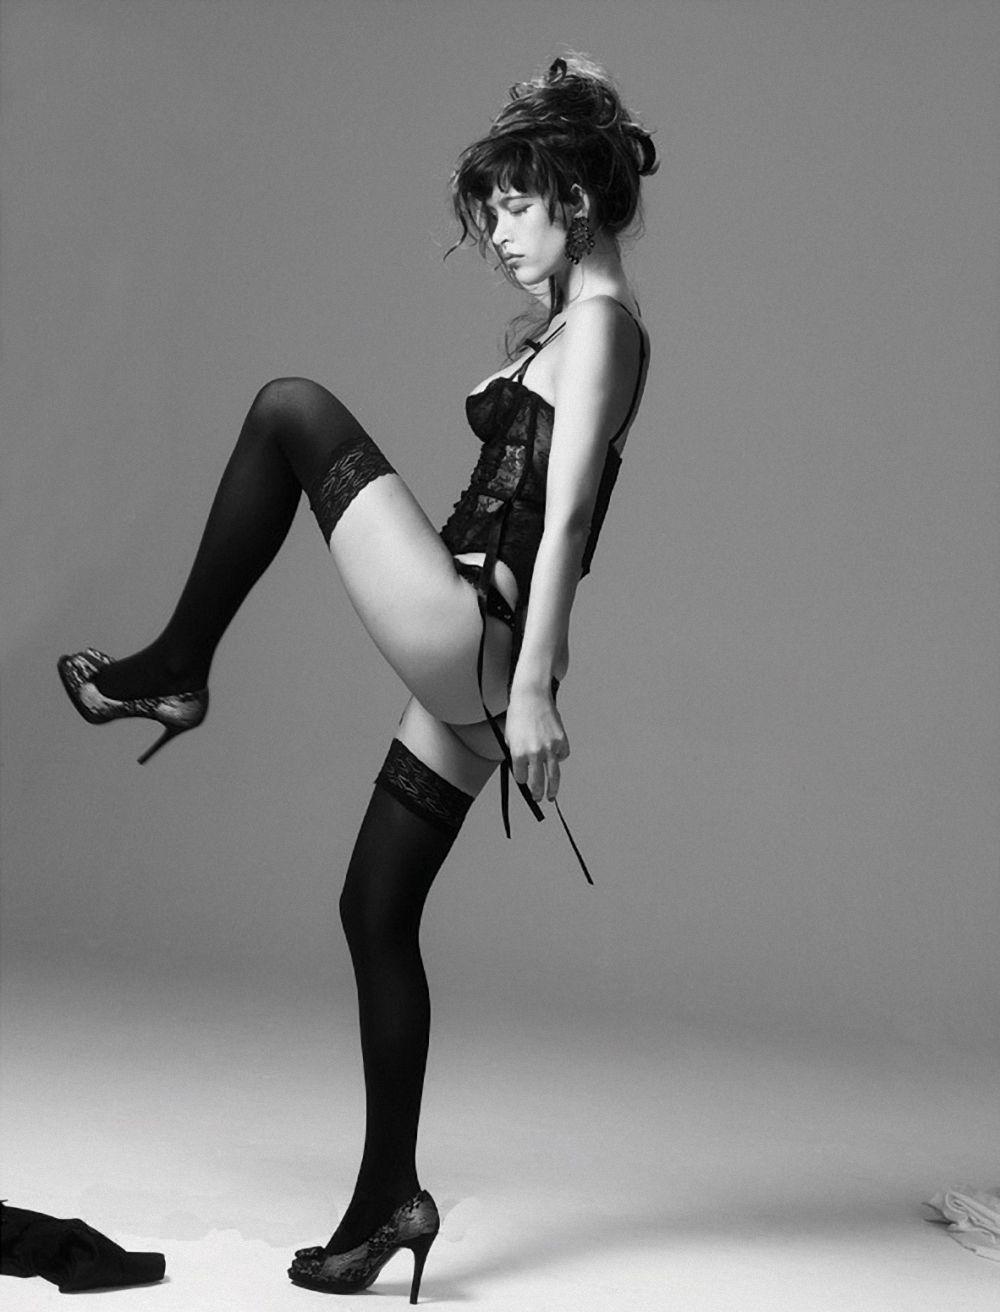 Celebrity Paz de la Huerta nudes (92 foto and video), Topless, Bikini, Selfie, braless 2020